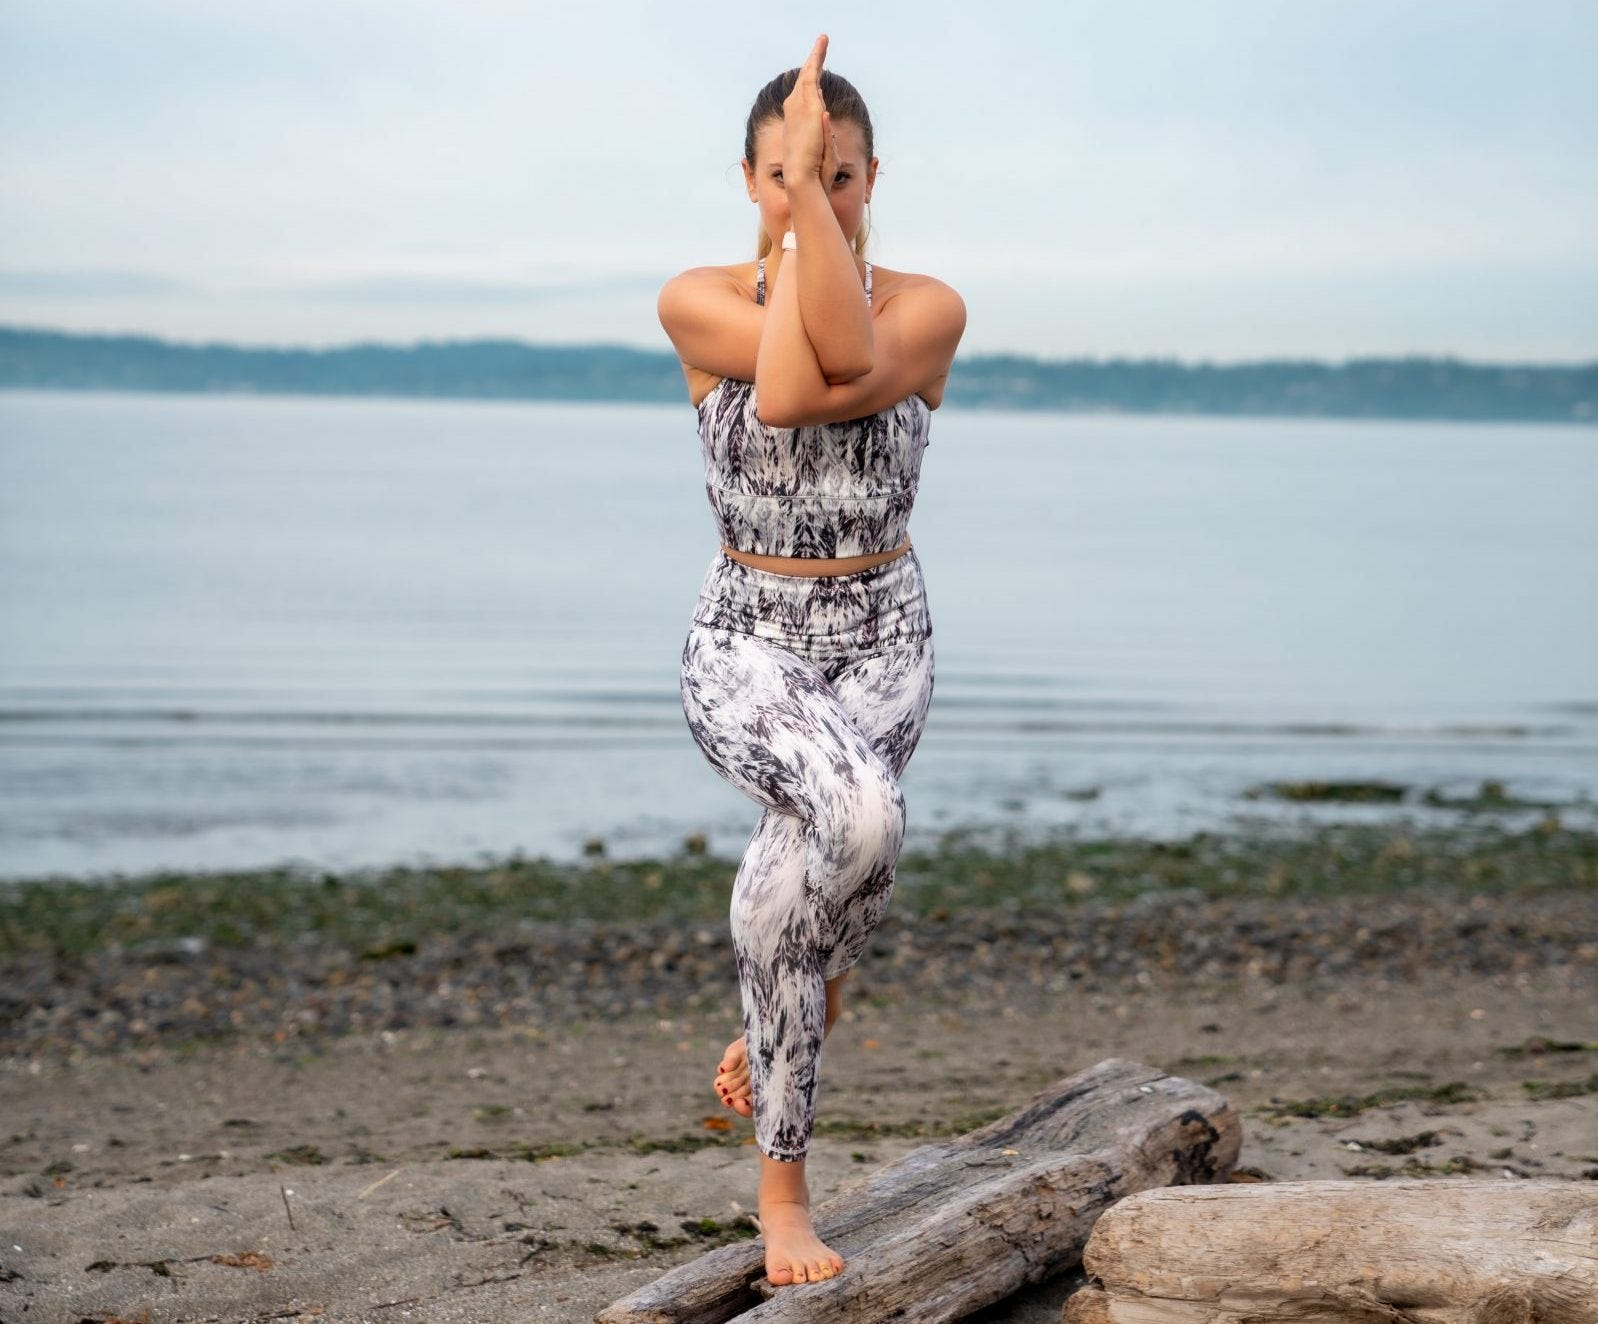 A woman doing an eagle yoga pose on the beach.